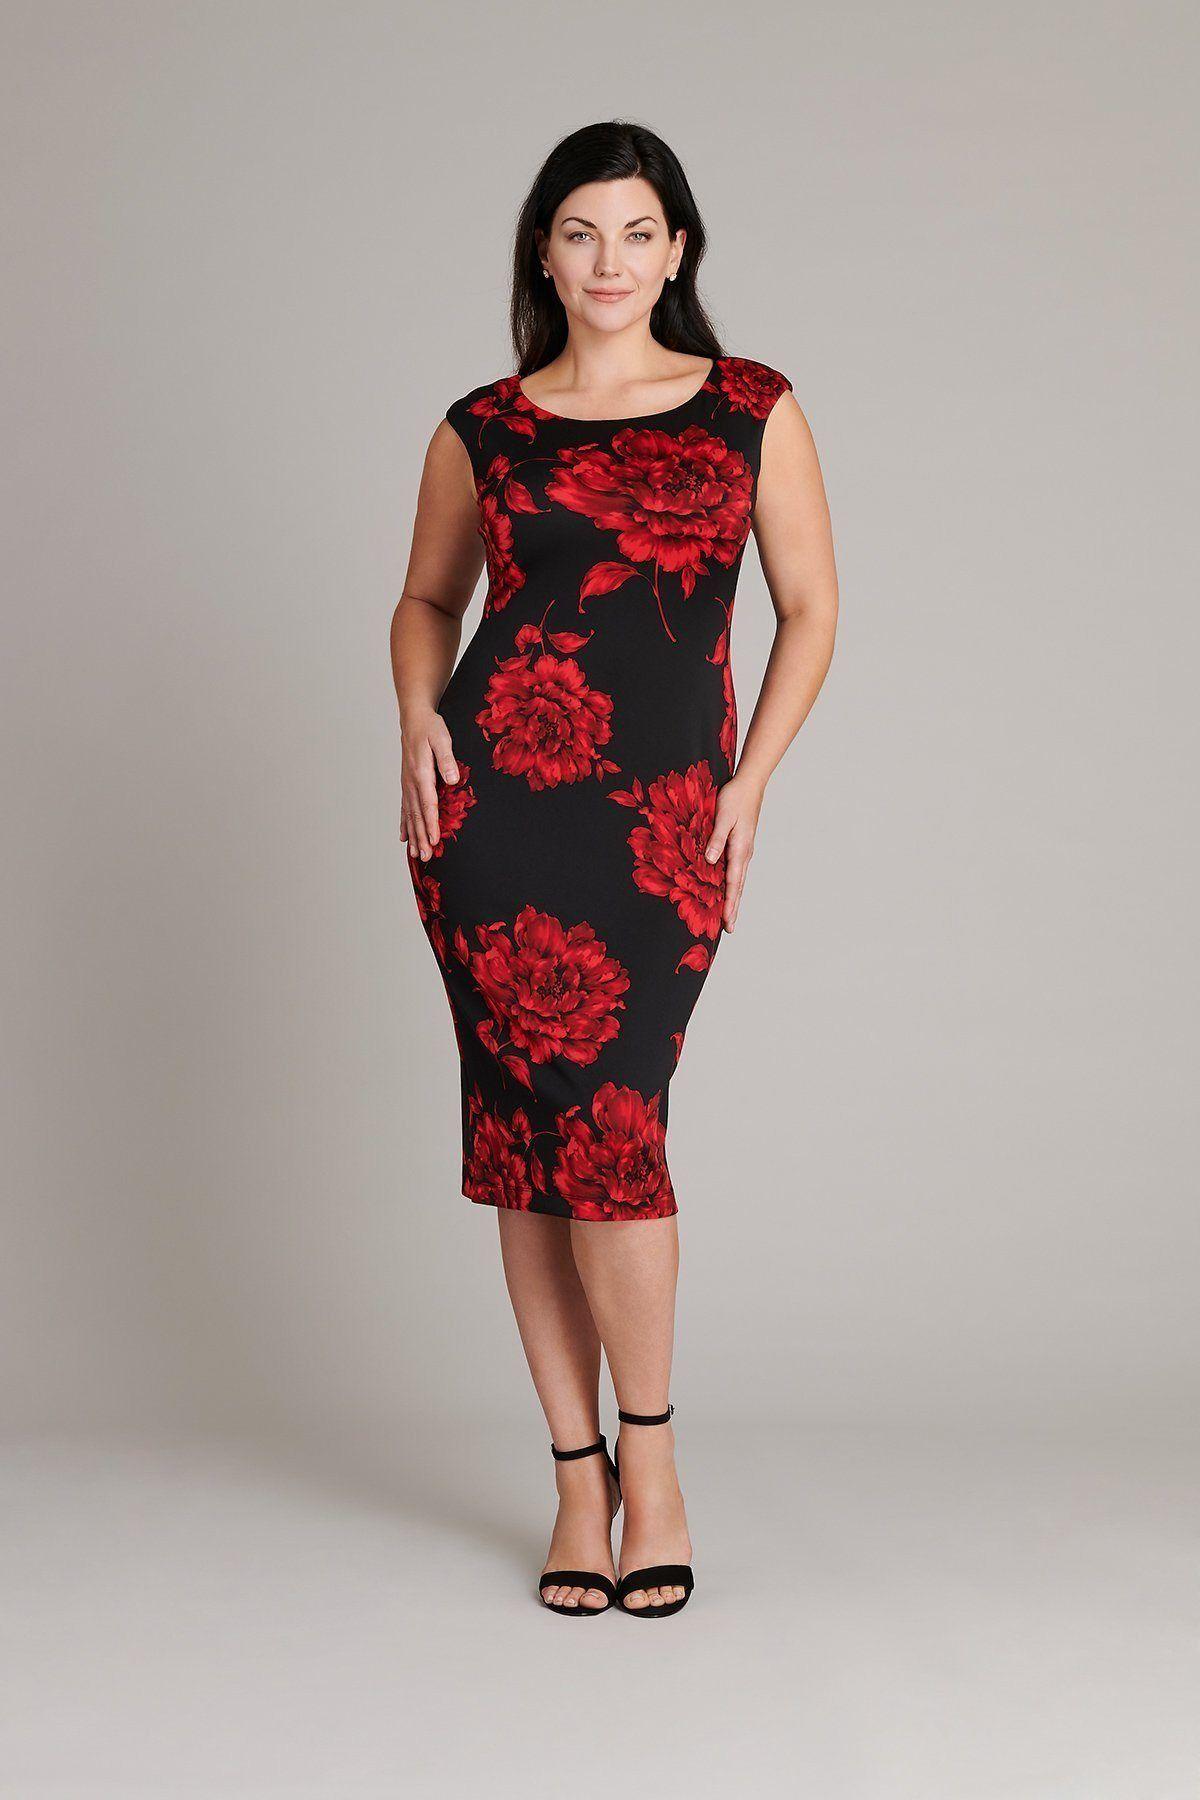 d659a11db5 The Billie Red Floral Print Midi Dress in 2019